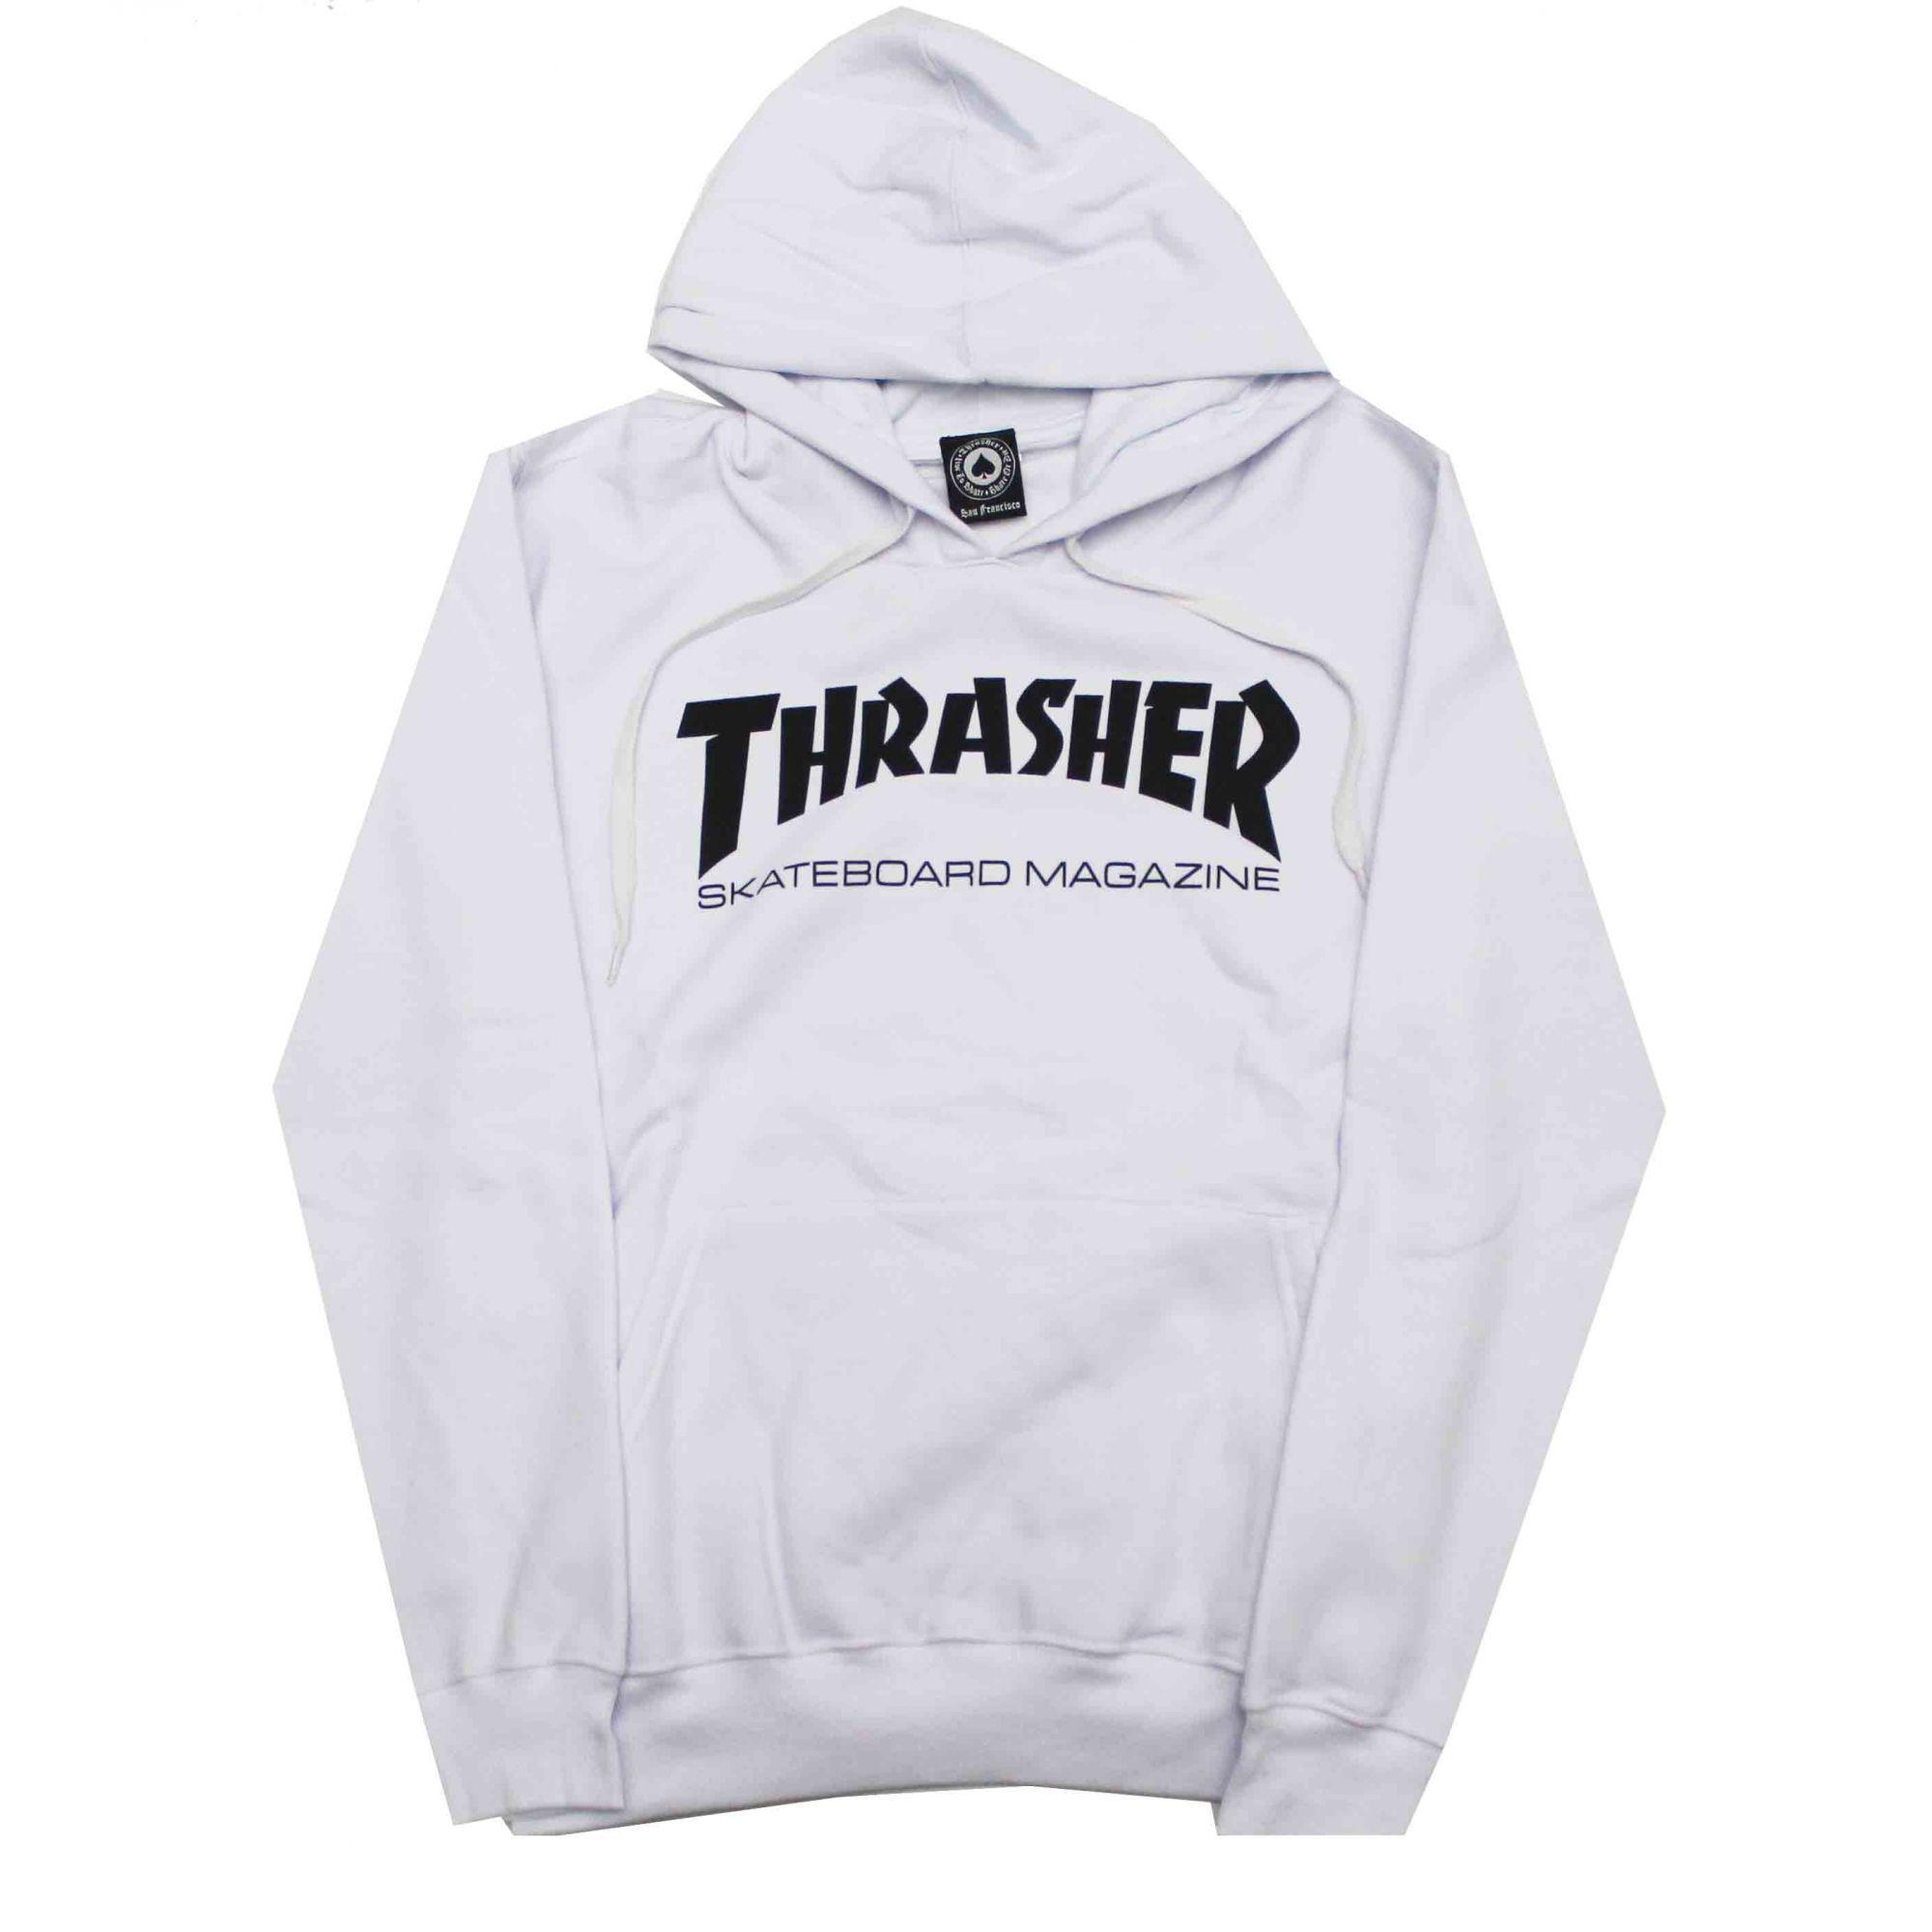 Moletom Thrasher Magazine Canguru Skate Mag Branco